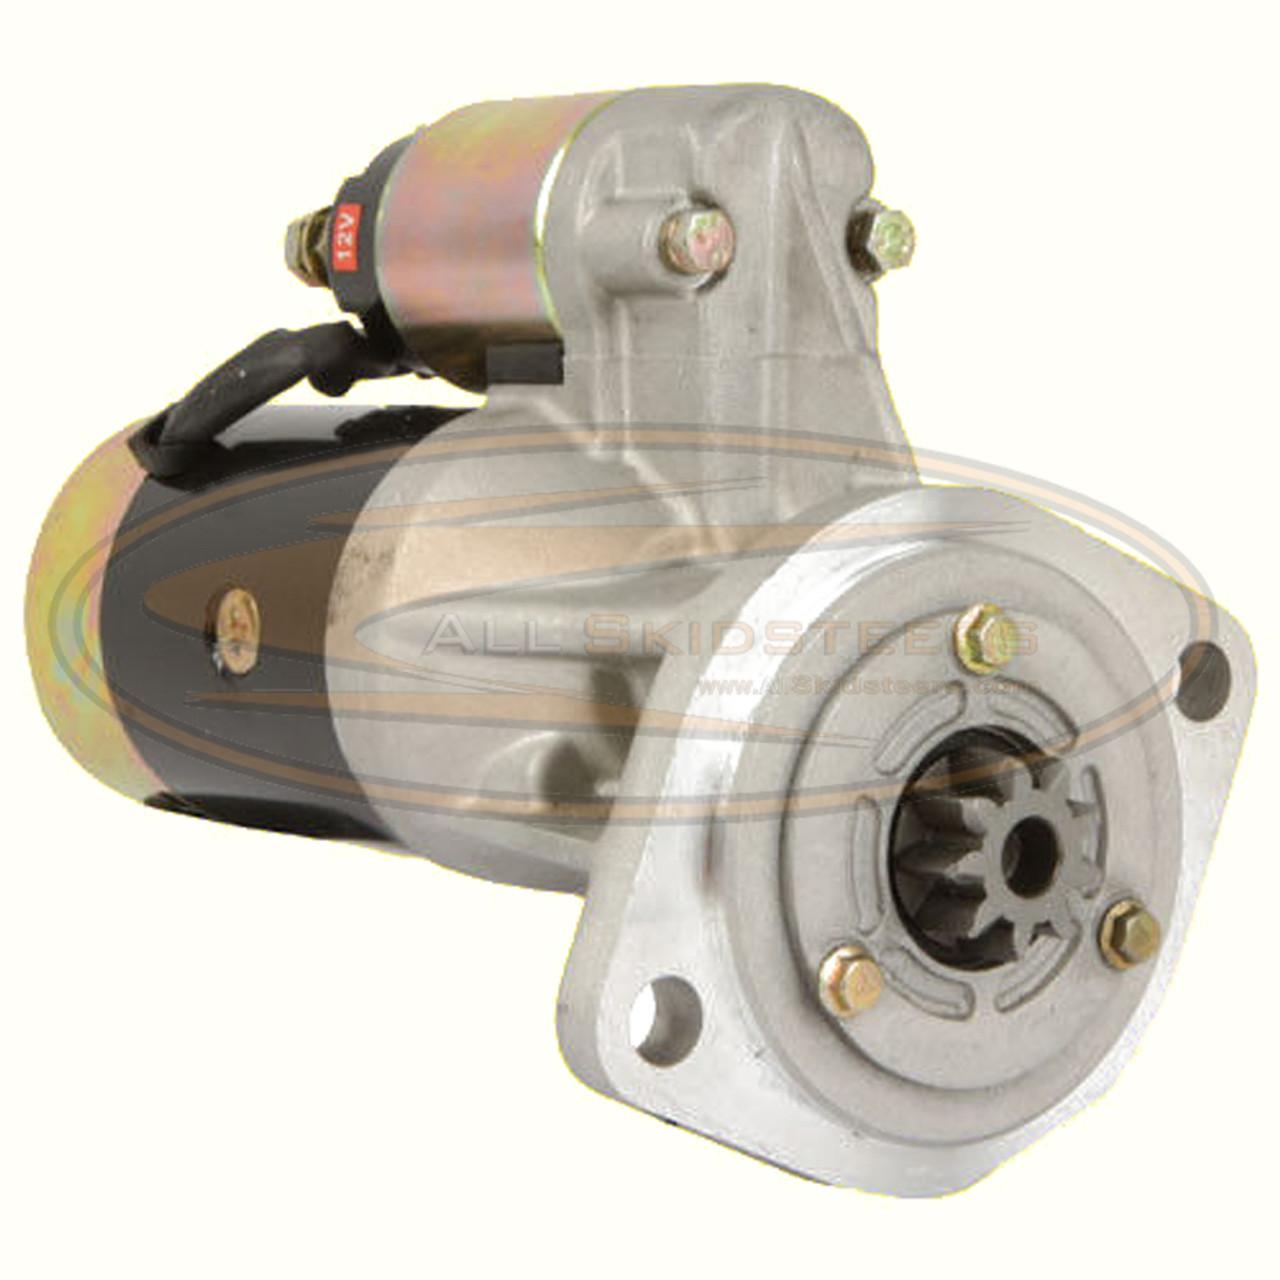 Starter for Mustang Skid Steer | Replaces OEM # 8944104090